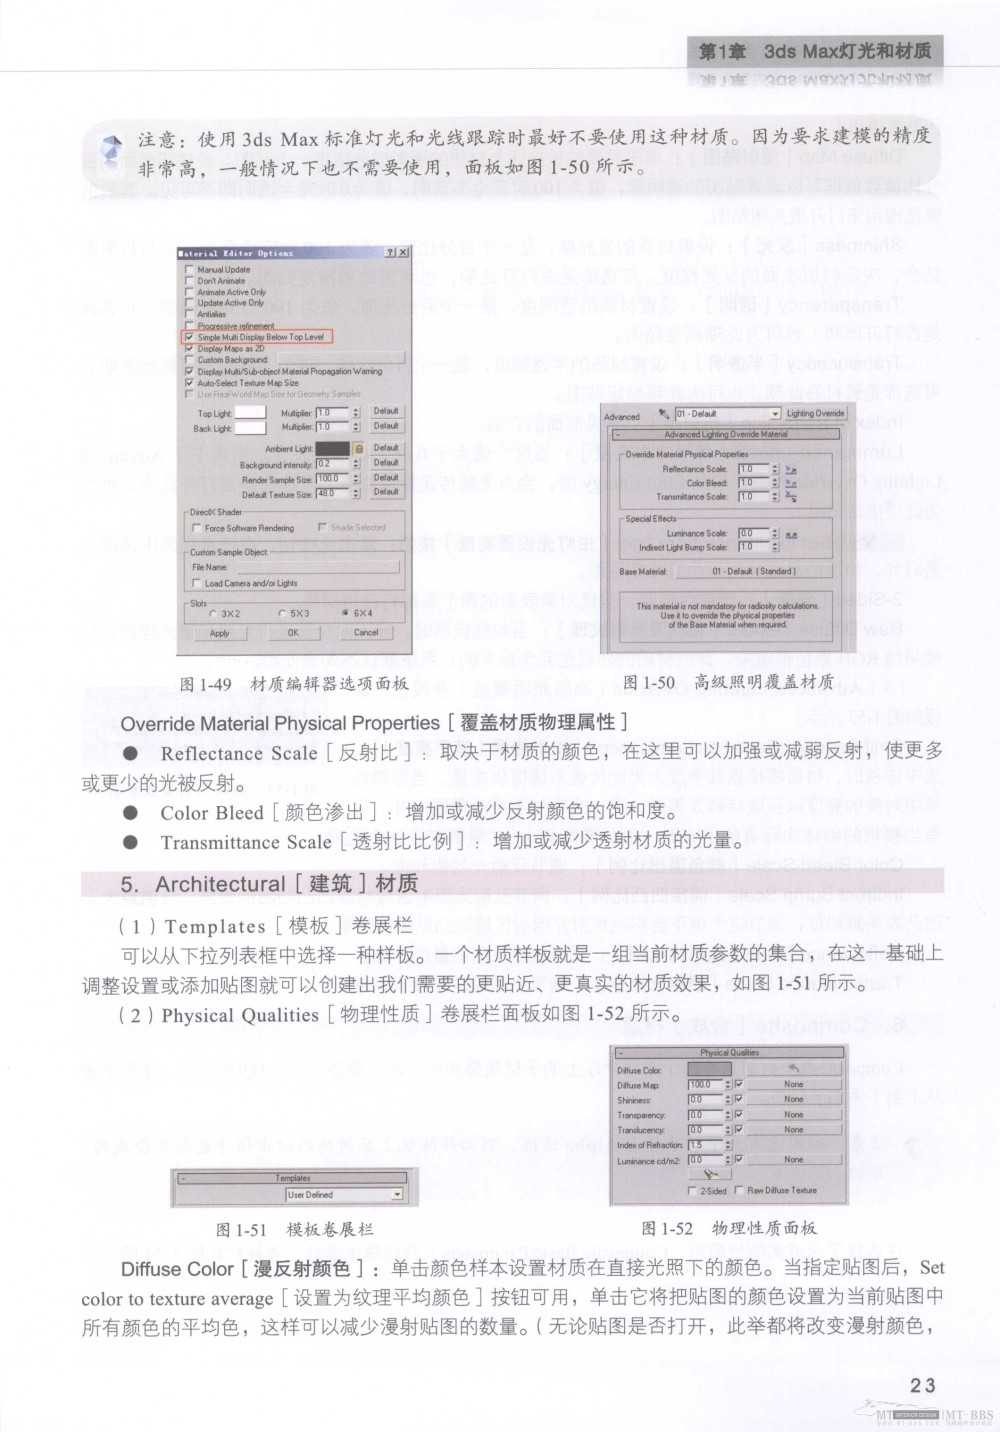 水晶石技法-3ds_Max&VRay室内空间表现_水晶石技法-3ds_Max&VRay室内空间表现_页面_029.jpg